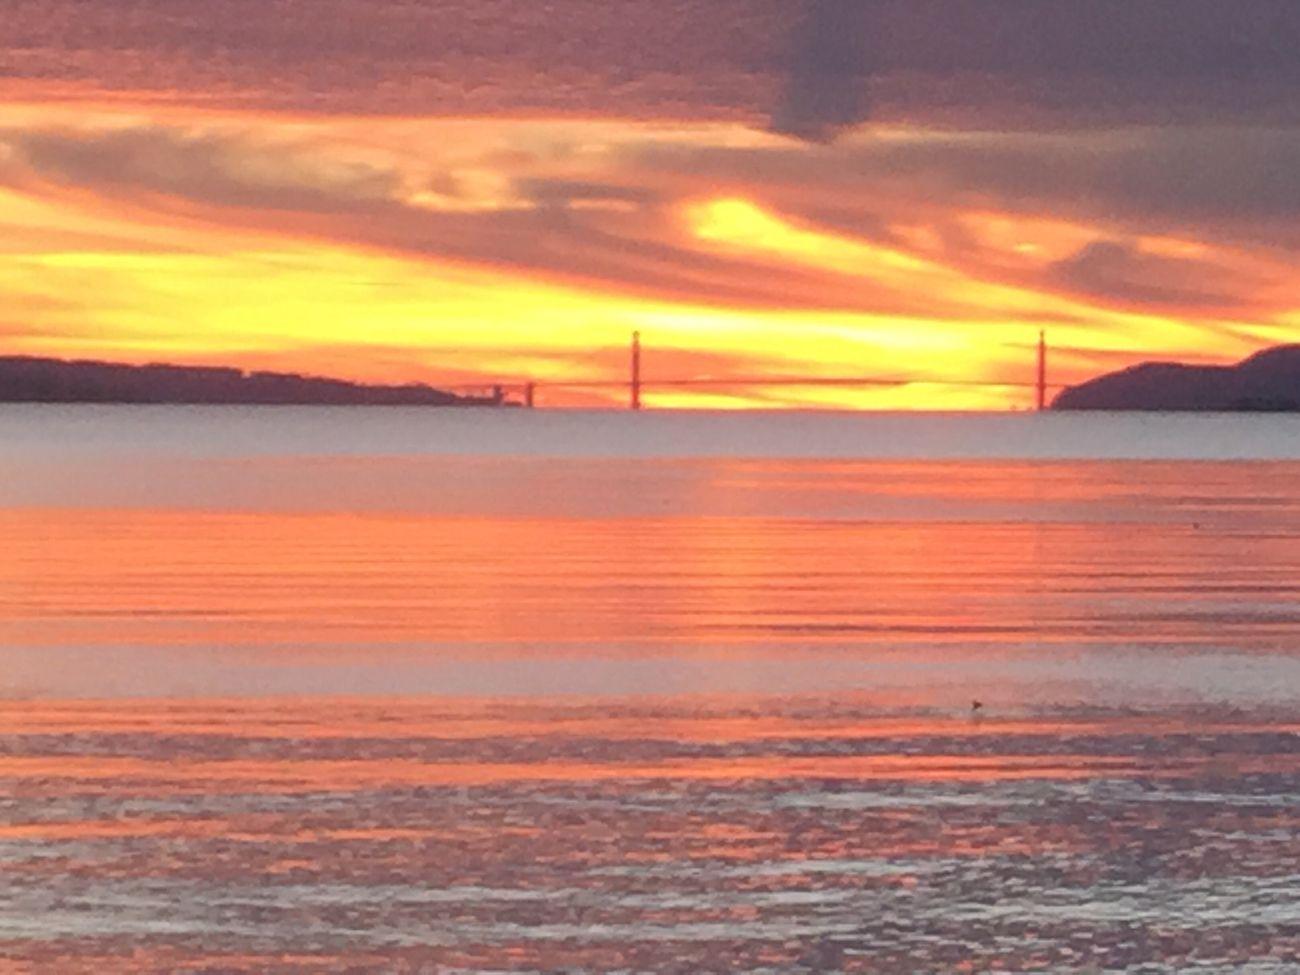 Golden Gate Sunset Orange Color Sky Water Scenics Cloud - Sky Waterfront Nofilter GoldenGateBridge SanFranciscoBay Horizon Over Water Built Structure Cloudscapes